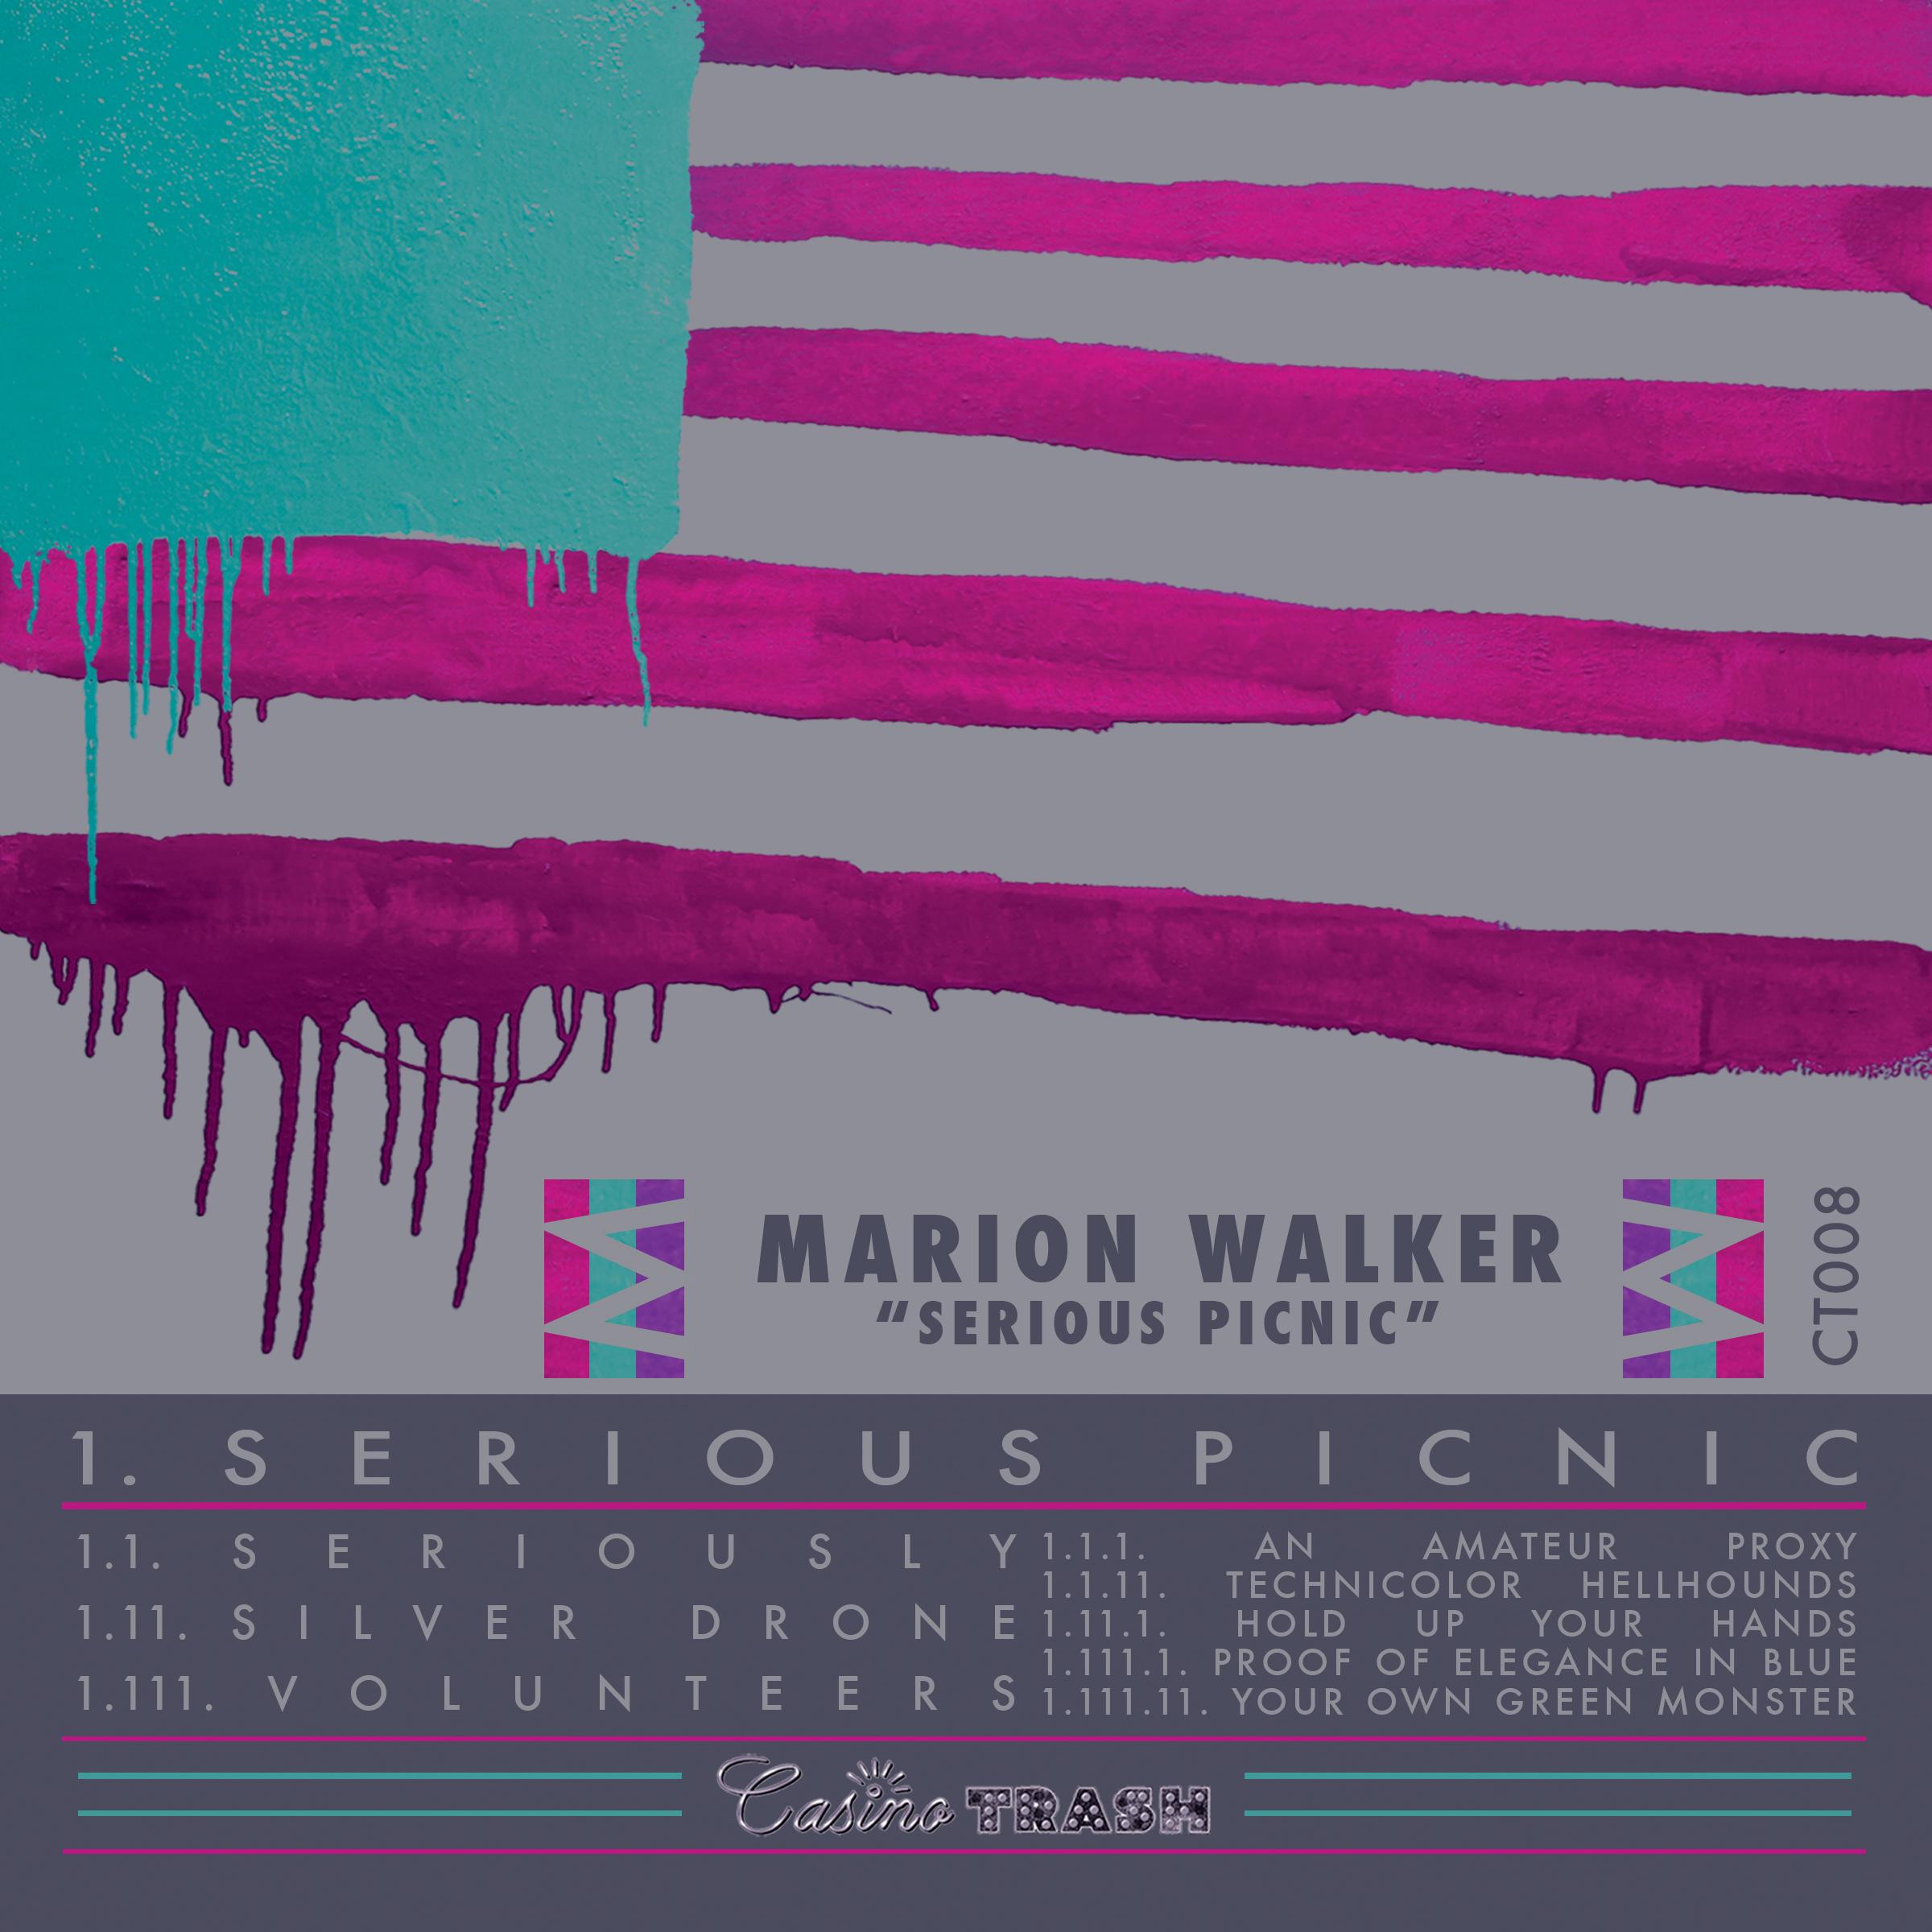 marion walker - serious picnic